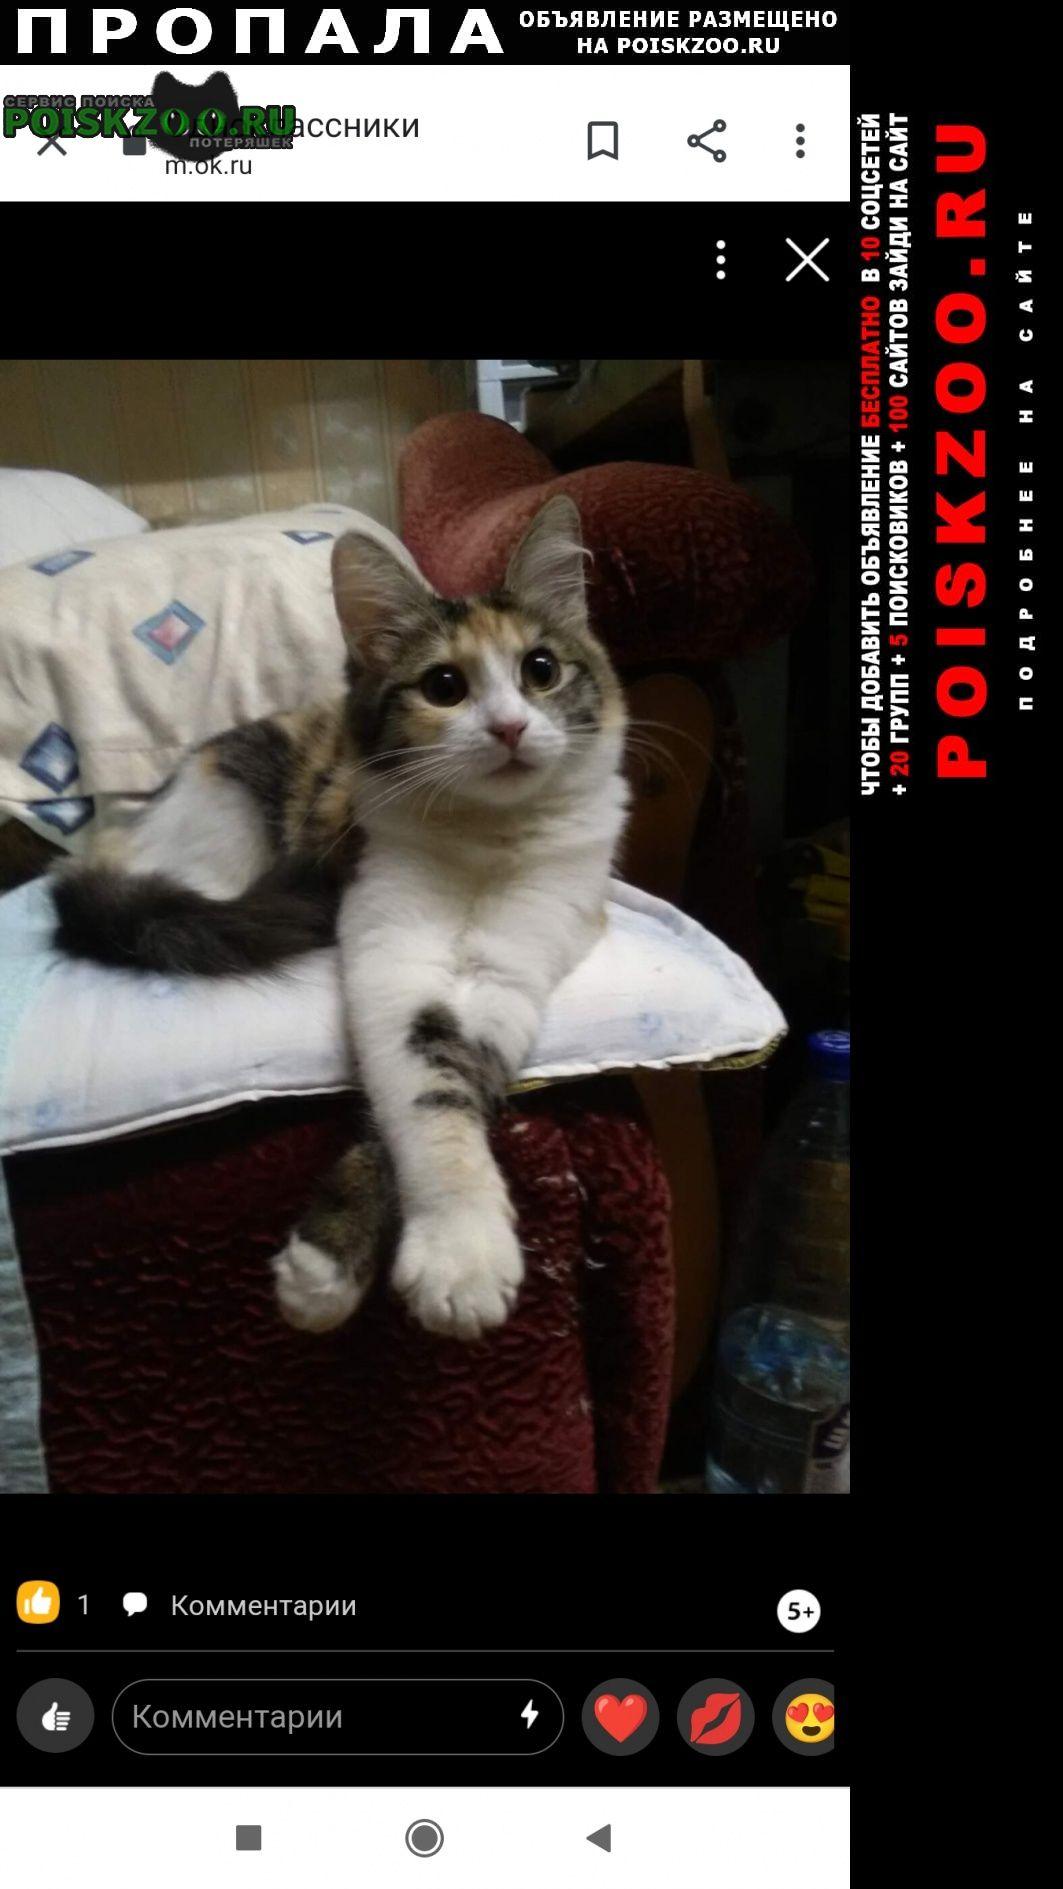 Пропала кошка трехшерстная Иваново